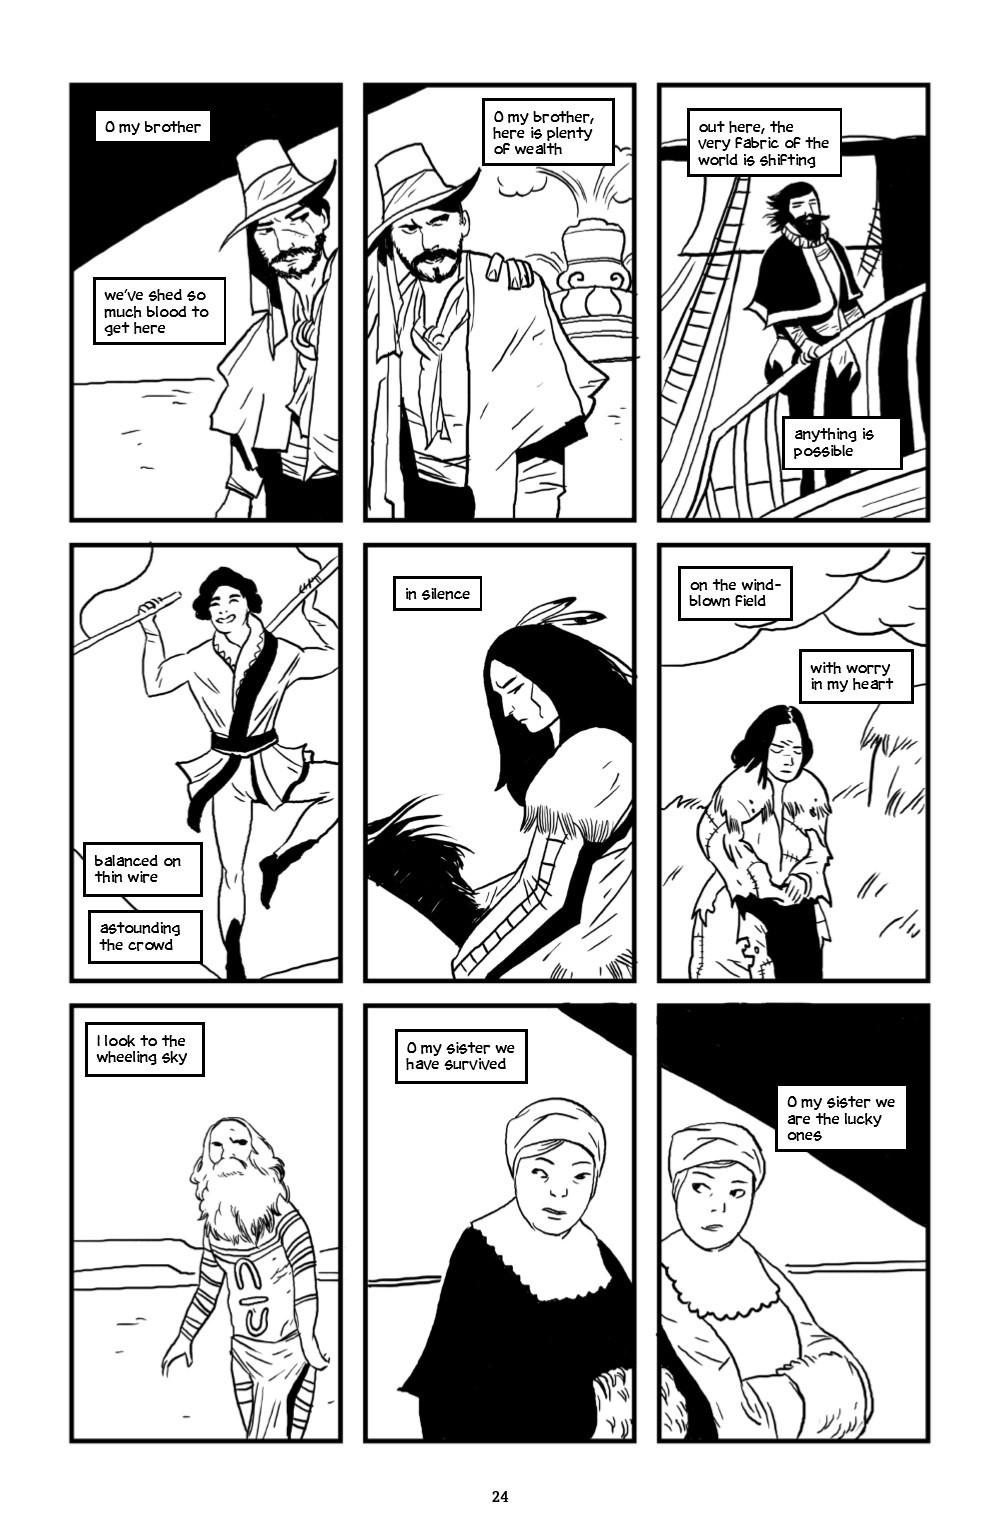 ONELINE-HC-MARKETING-025 ComicList Previews: ONE LINE HC